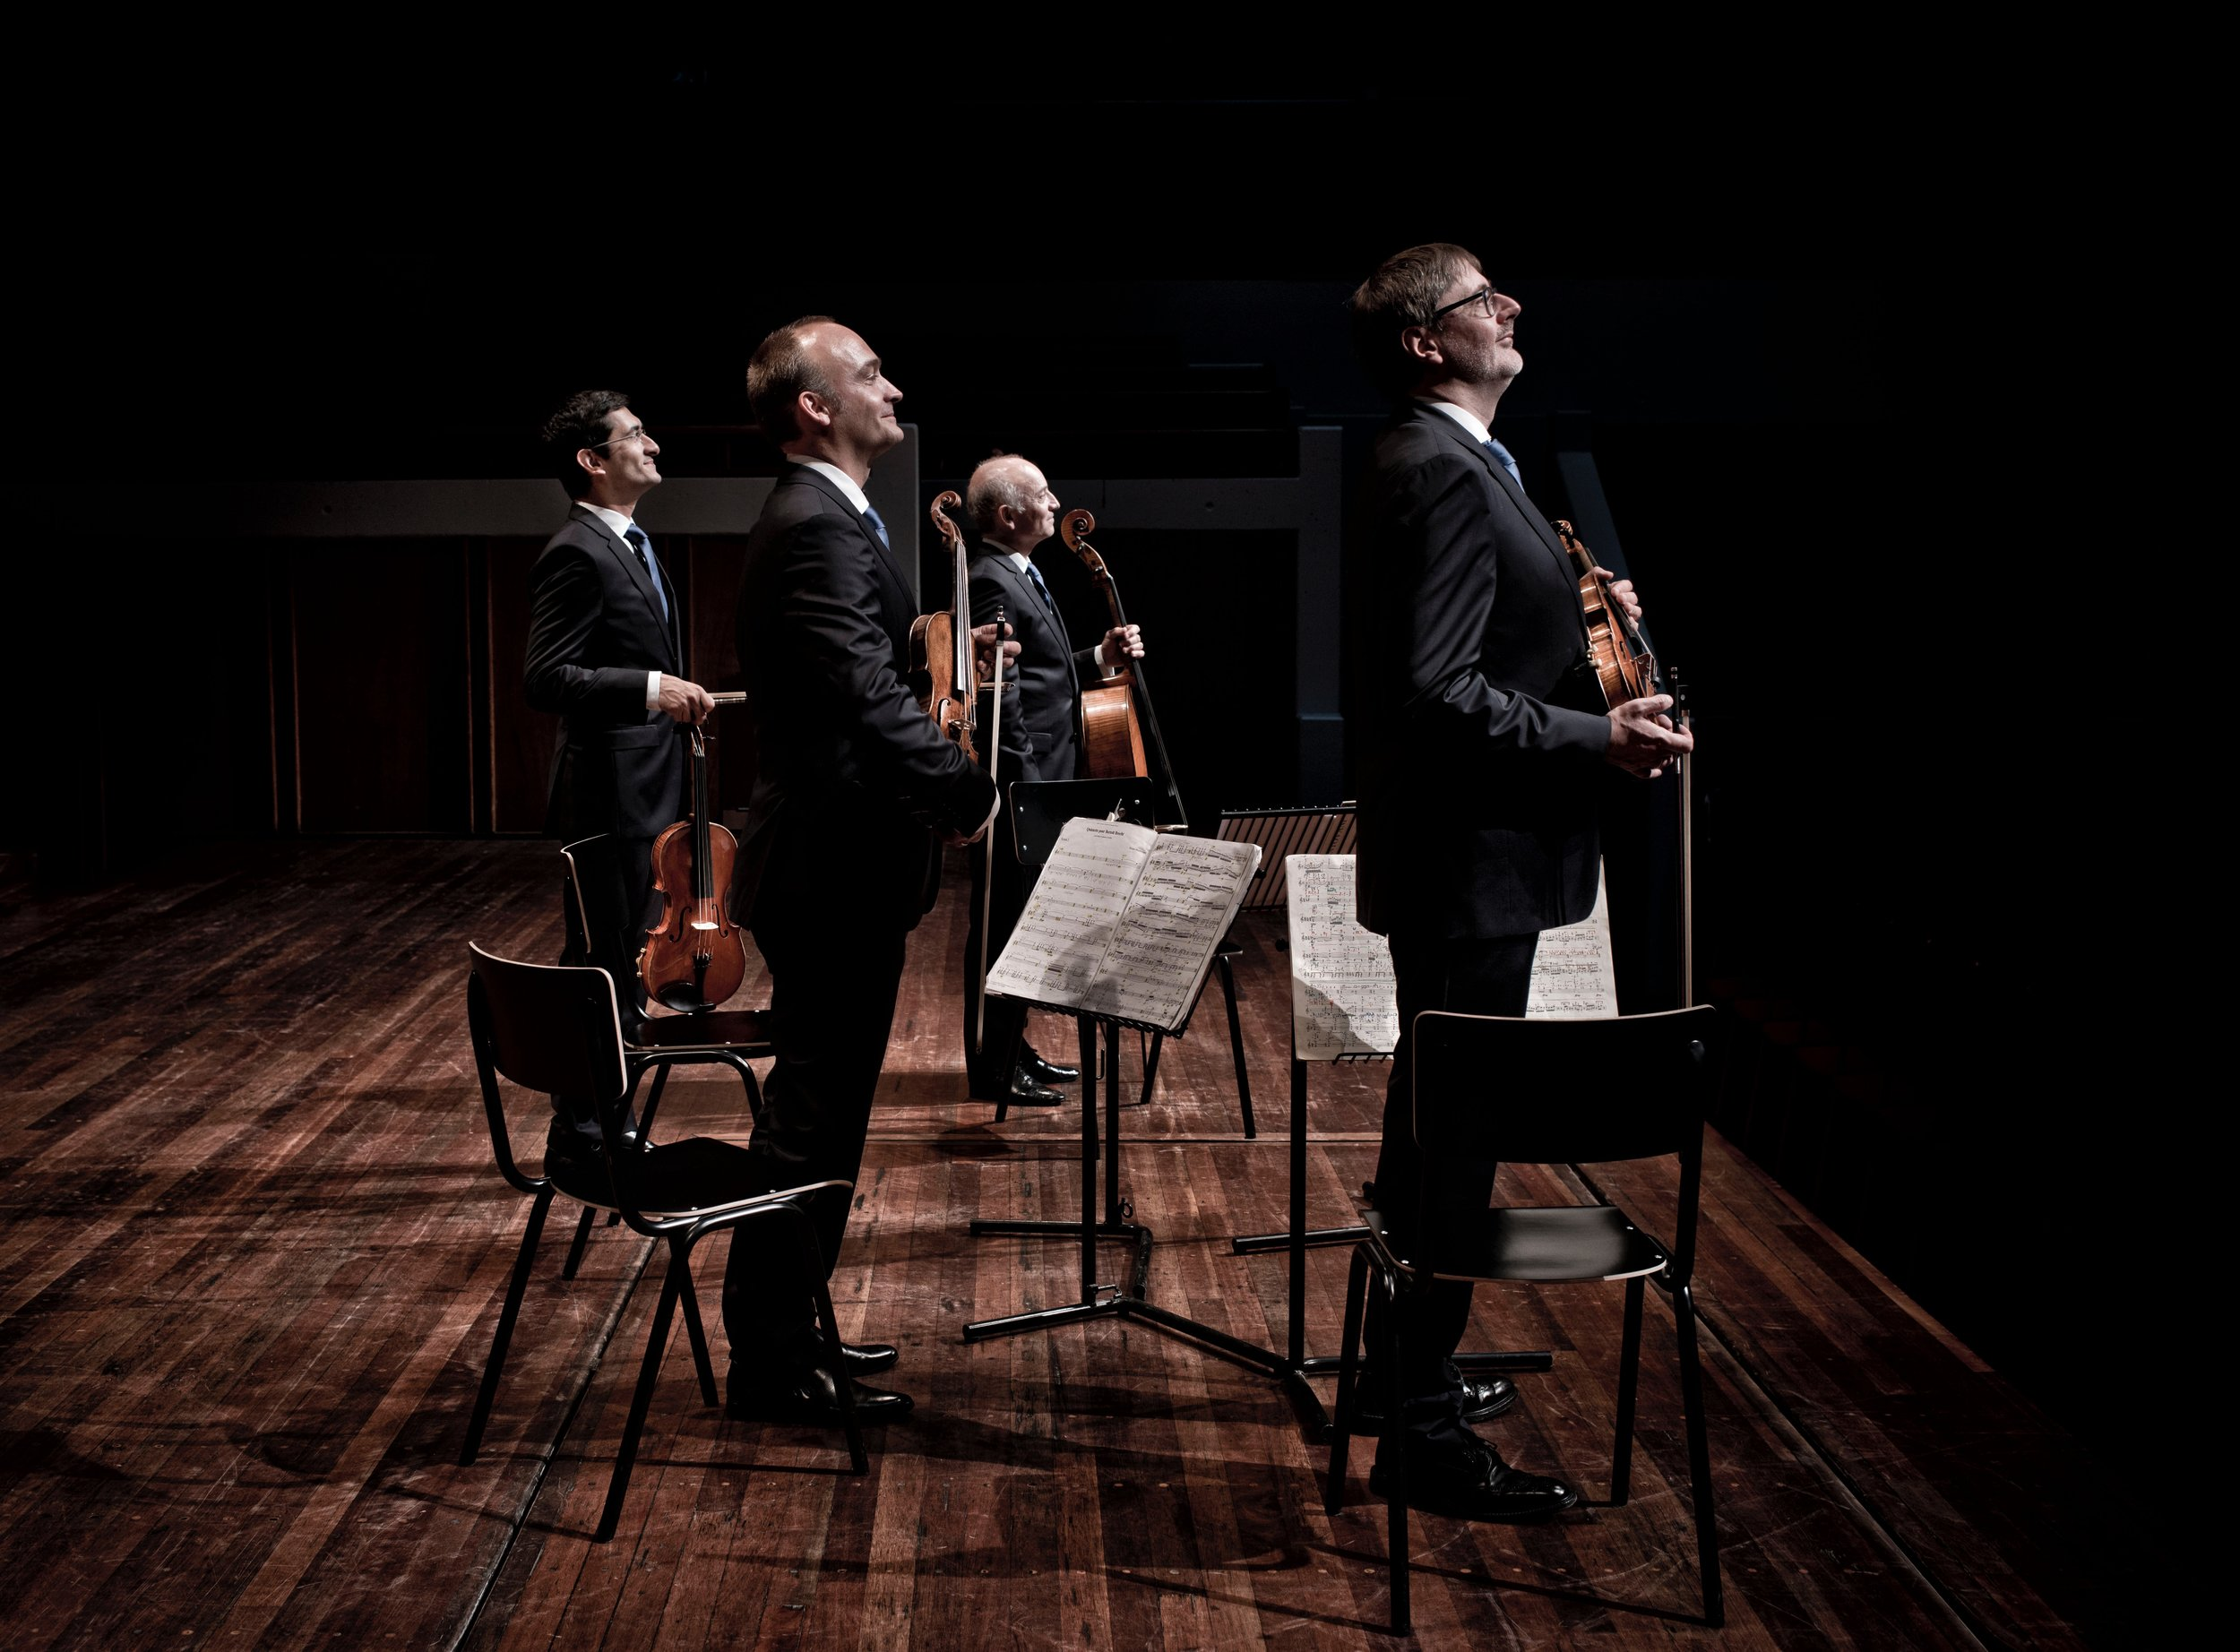 Quatuor Danel 4_credit Marco Borggreve.jpg